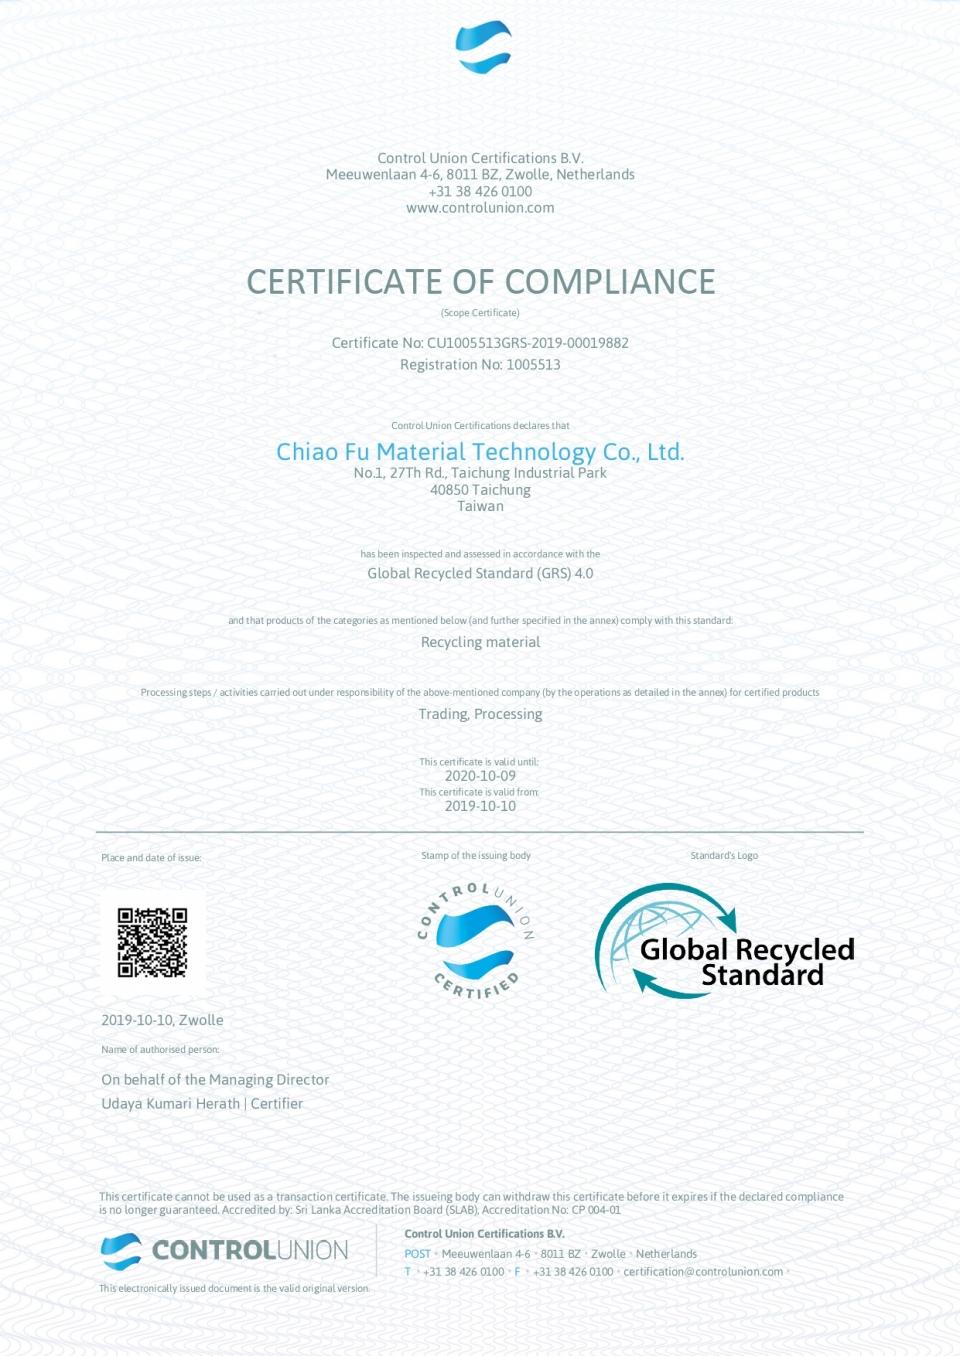 GRS_Scope_Certificate_2019-10-10 13_12_26 UTC_page-0001